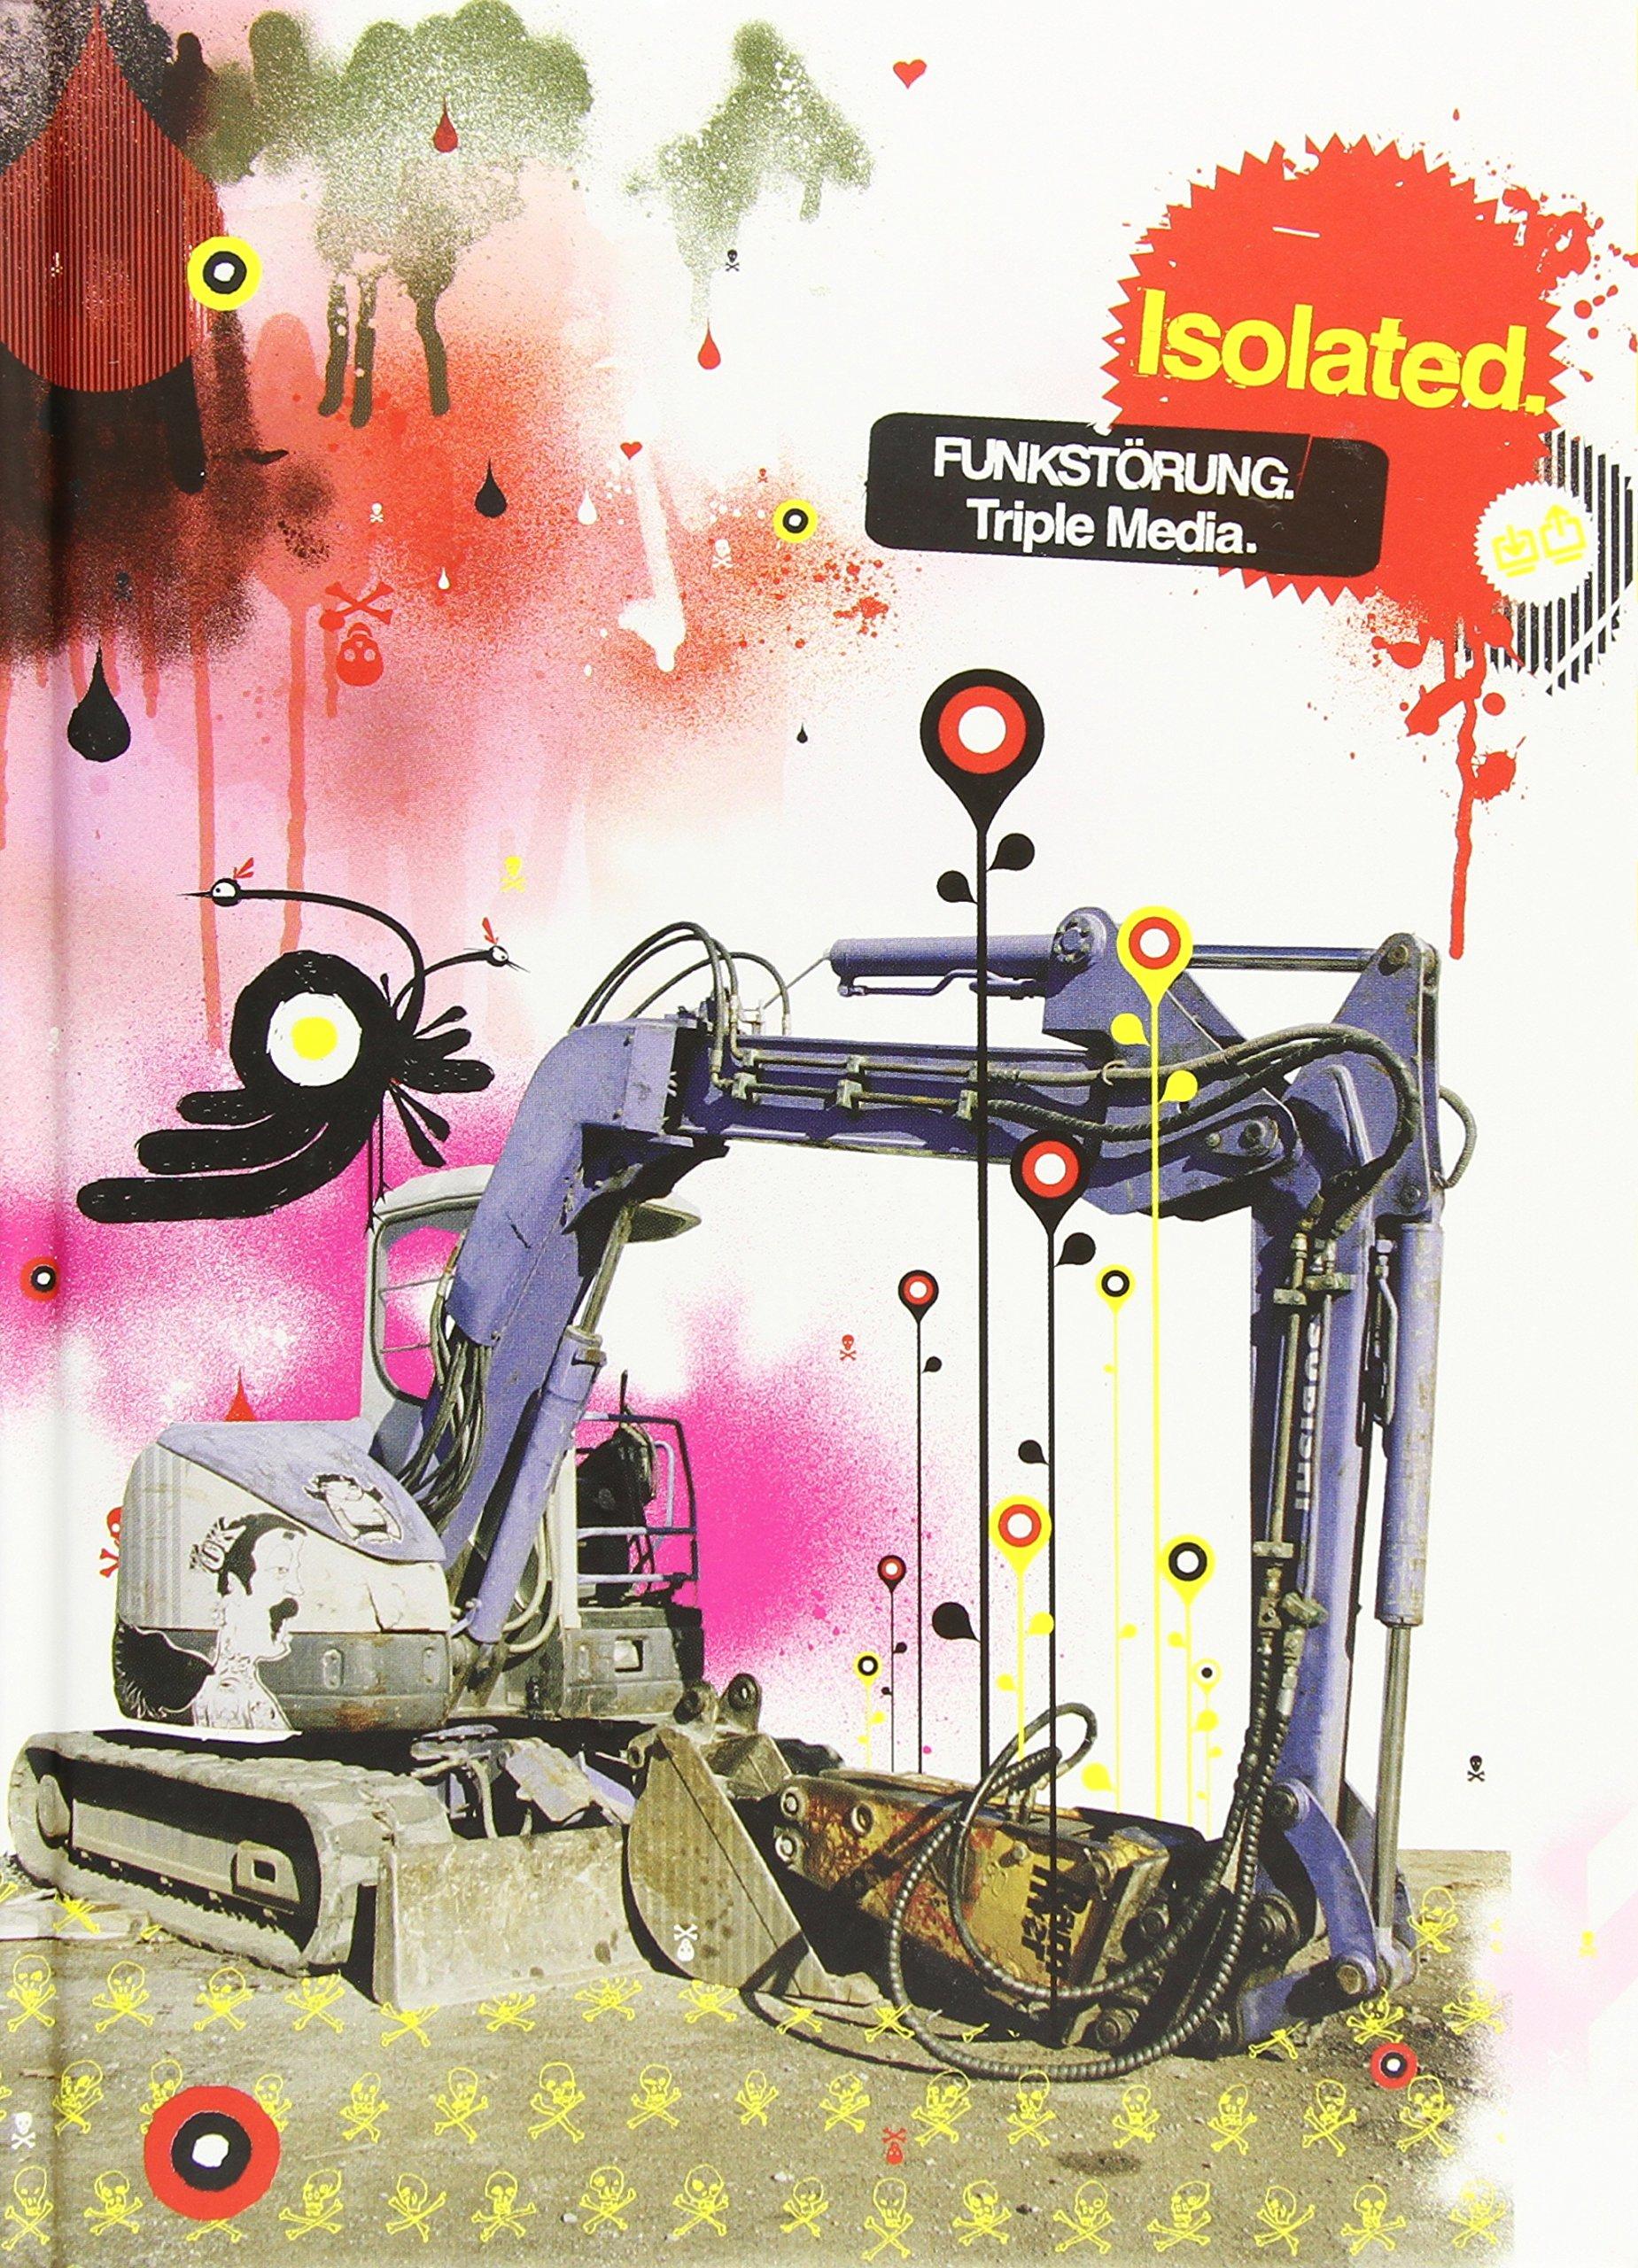 DVD : Funkstörung - Isolated Funkstorung Triple Media (With Book)